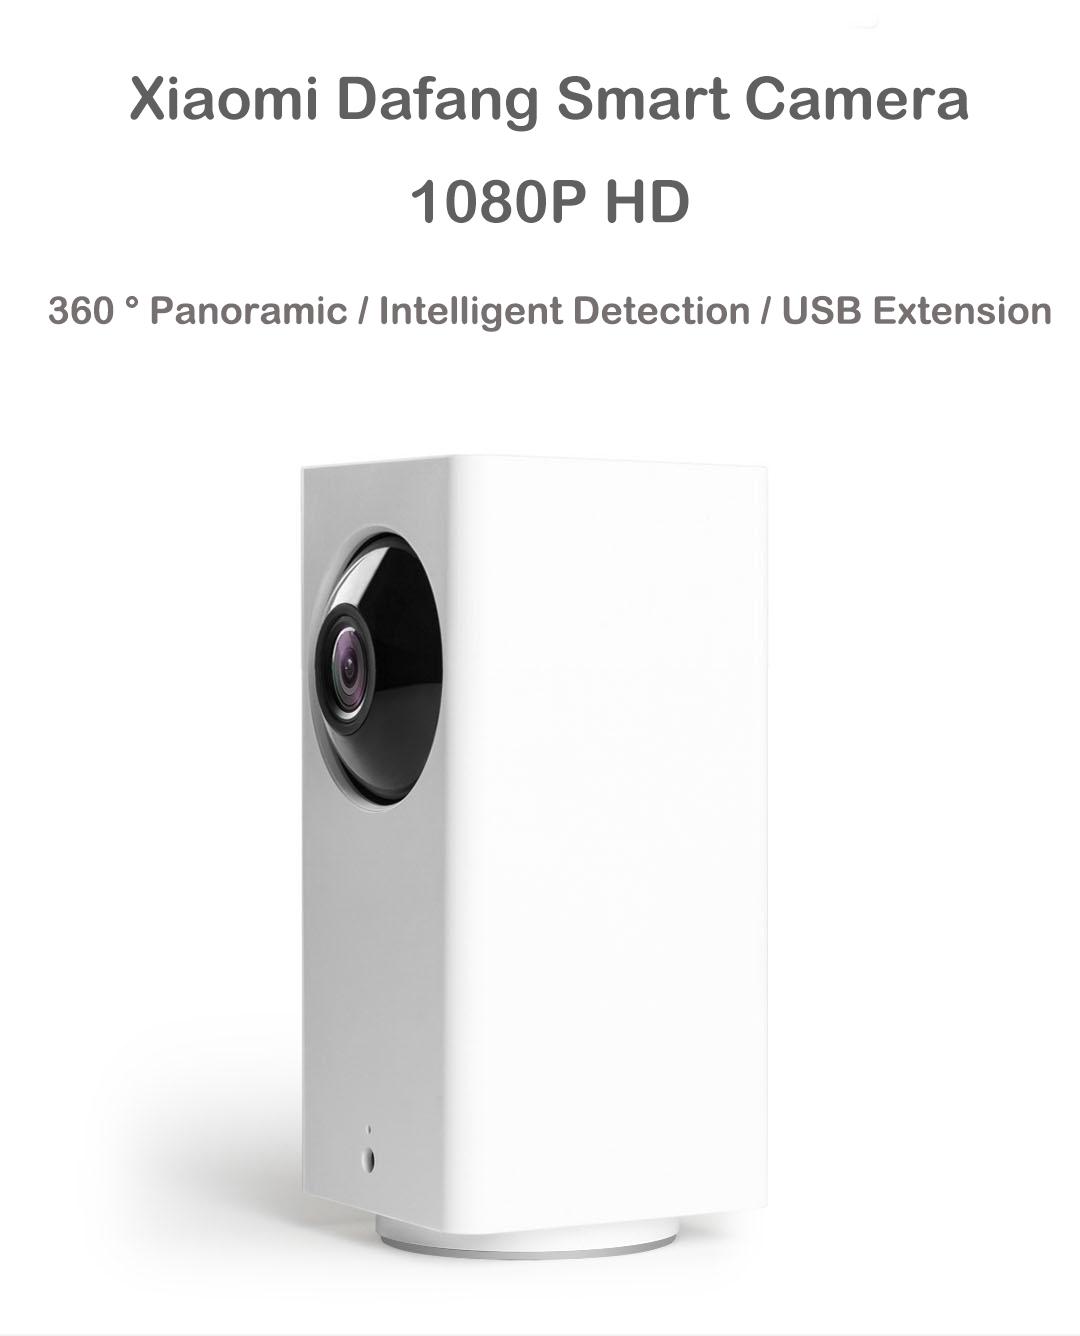 Xiaomi MIjia Dafang Smart Home 120 Degree 1080p HD Intelligent Security WIFI IP Camera Night Vision IR-cut Motion Detection Monitor